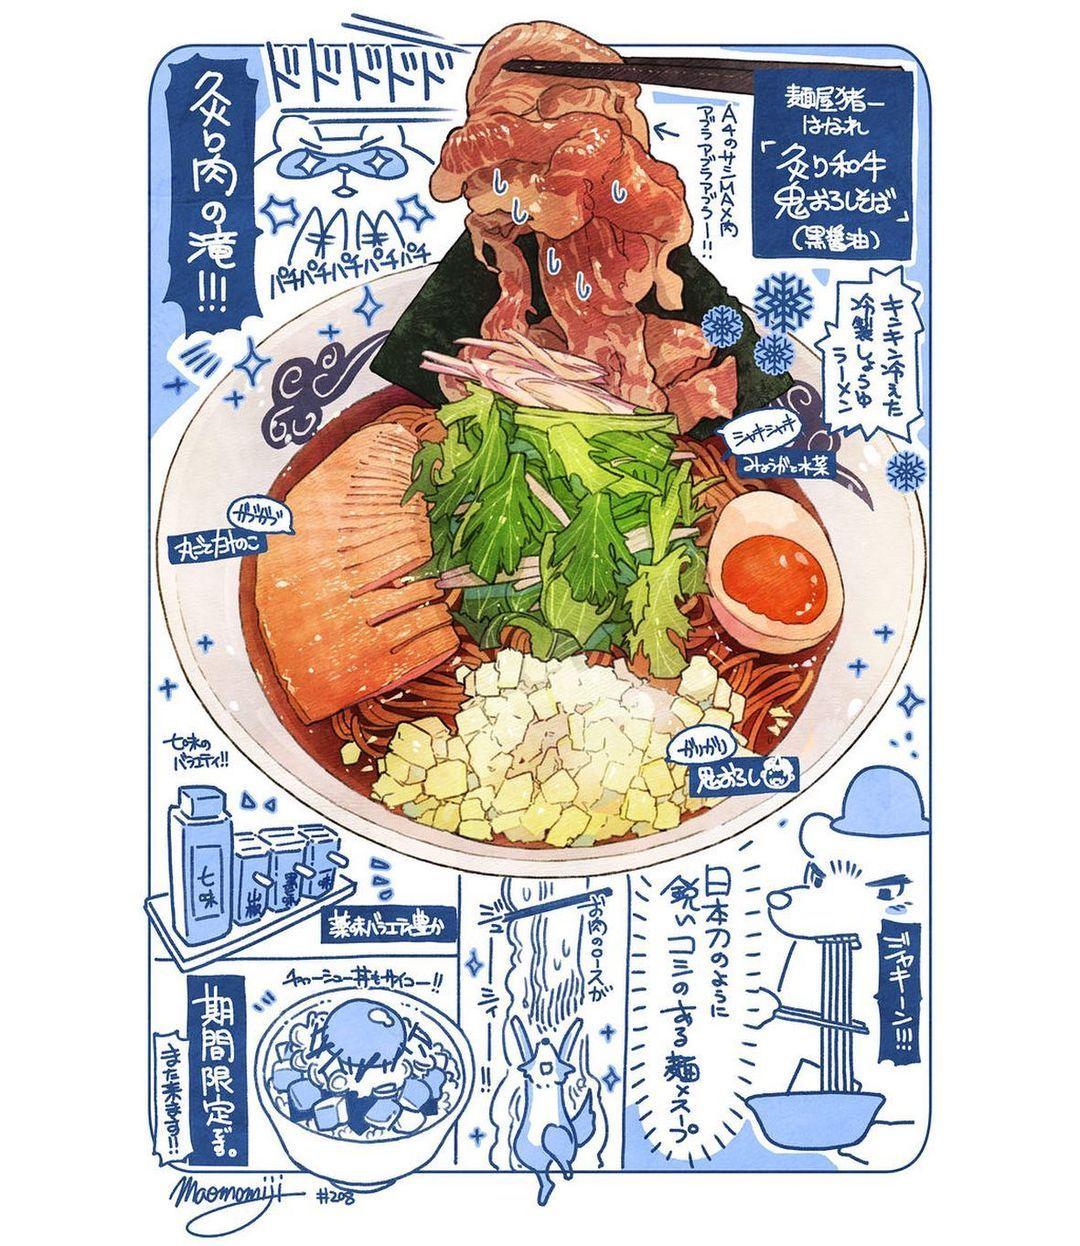 Instagram 上的 Maomomiji もみじ真魚 208 食べレポ 麺屋猪一離れの 炙り和牛の鬼おろしそば 黒醤油 2019 10 31 食品の描画 水彩画 食品 フードグラフィックデザイン